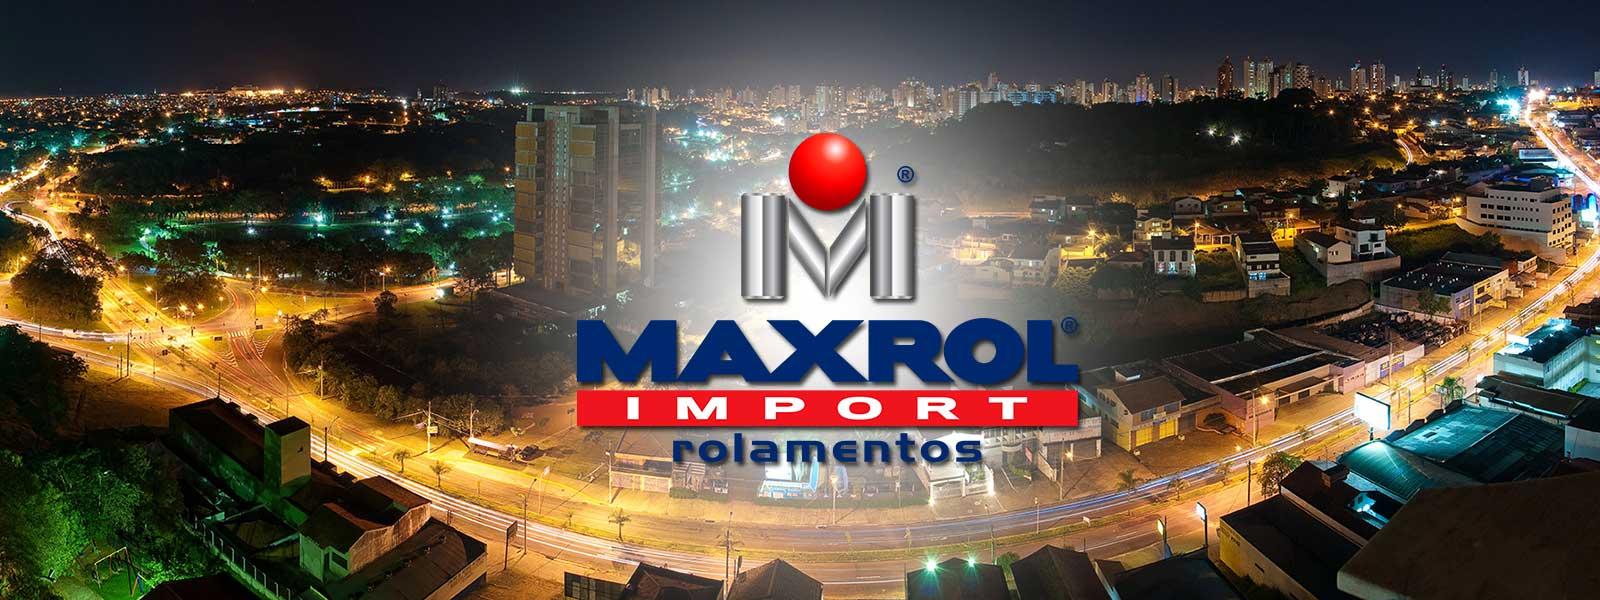 maxrol_rolamentos.jpg